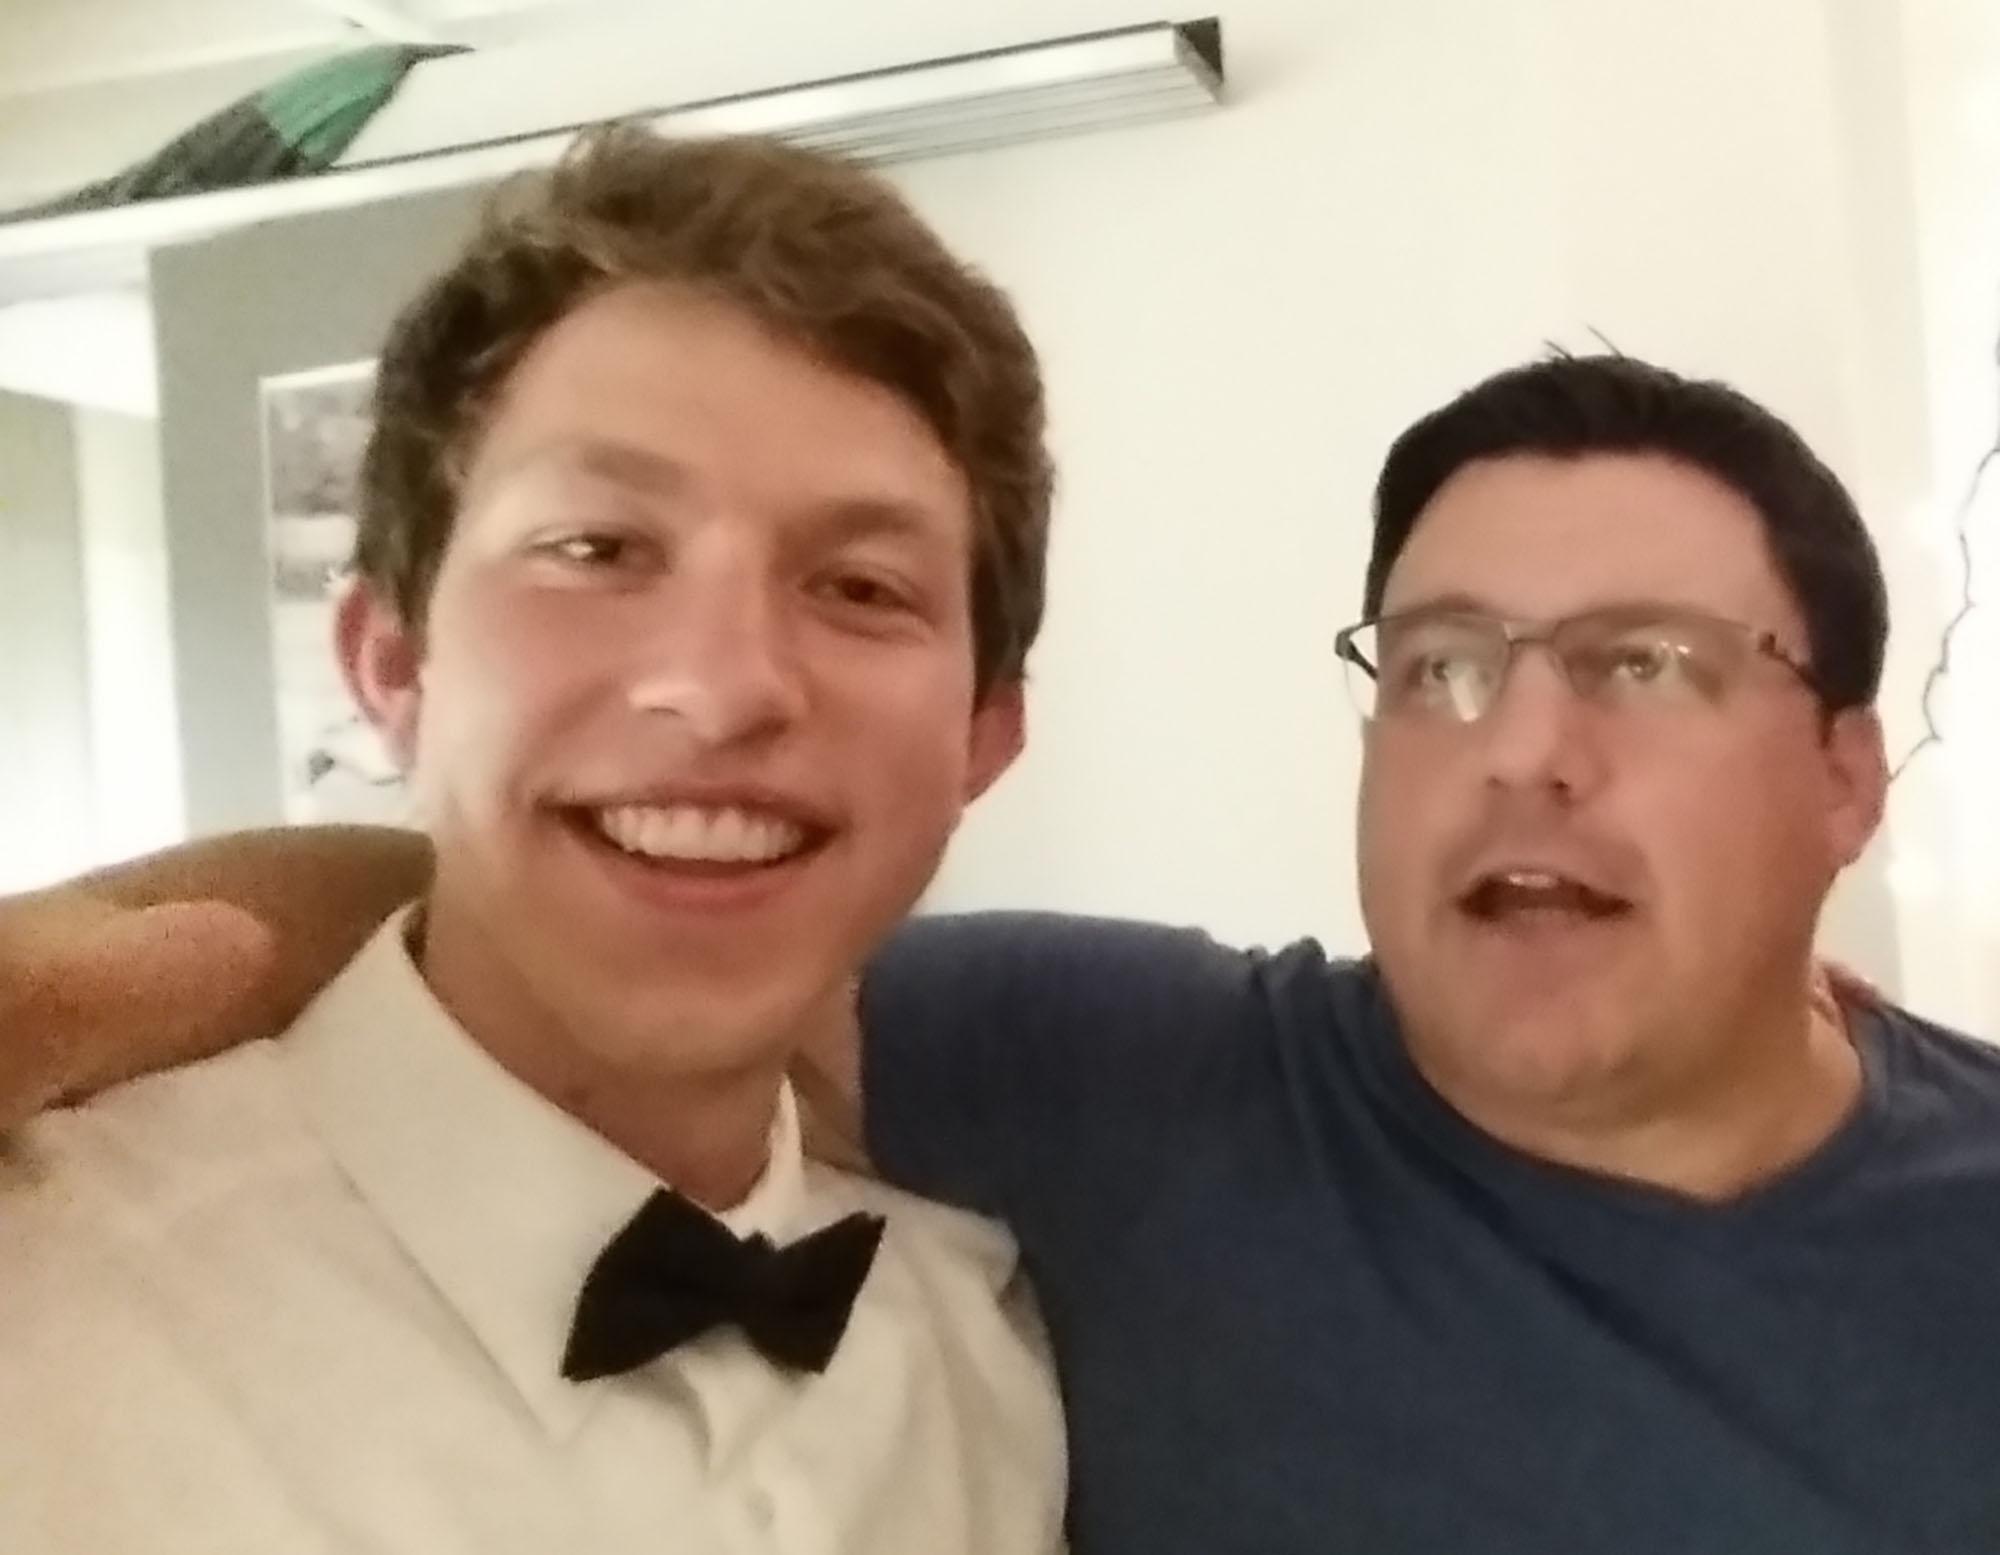 Caleb Longenecker takes a selfie with Jason Samuel